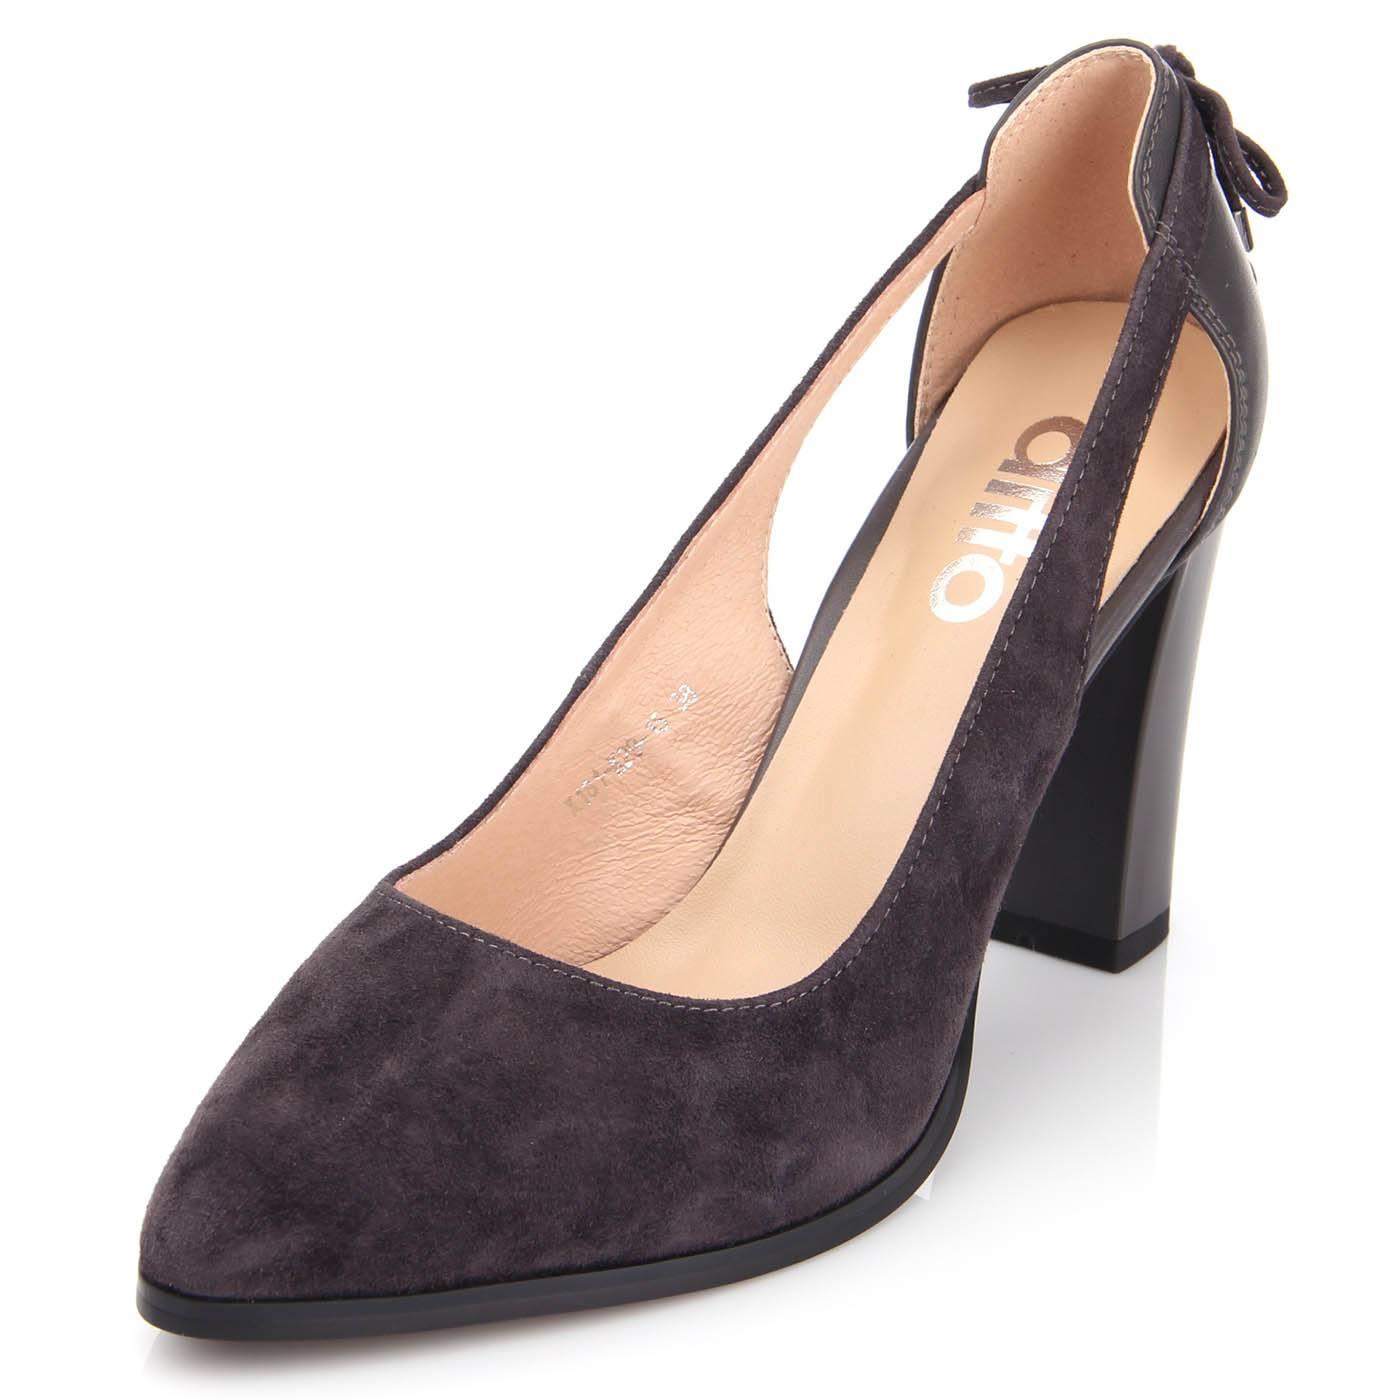 Туфлі жіночі ditto 6904 Сірий купить по выгодной цене в интернет ... 2c73df1a7c9b9